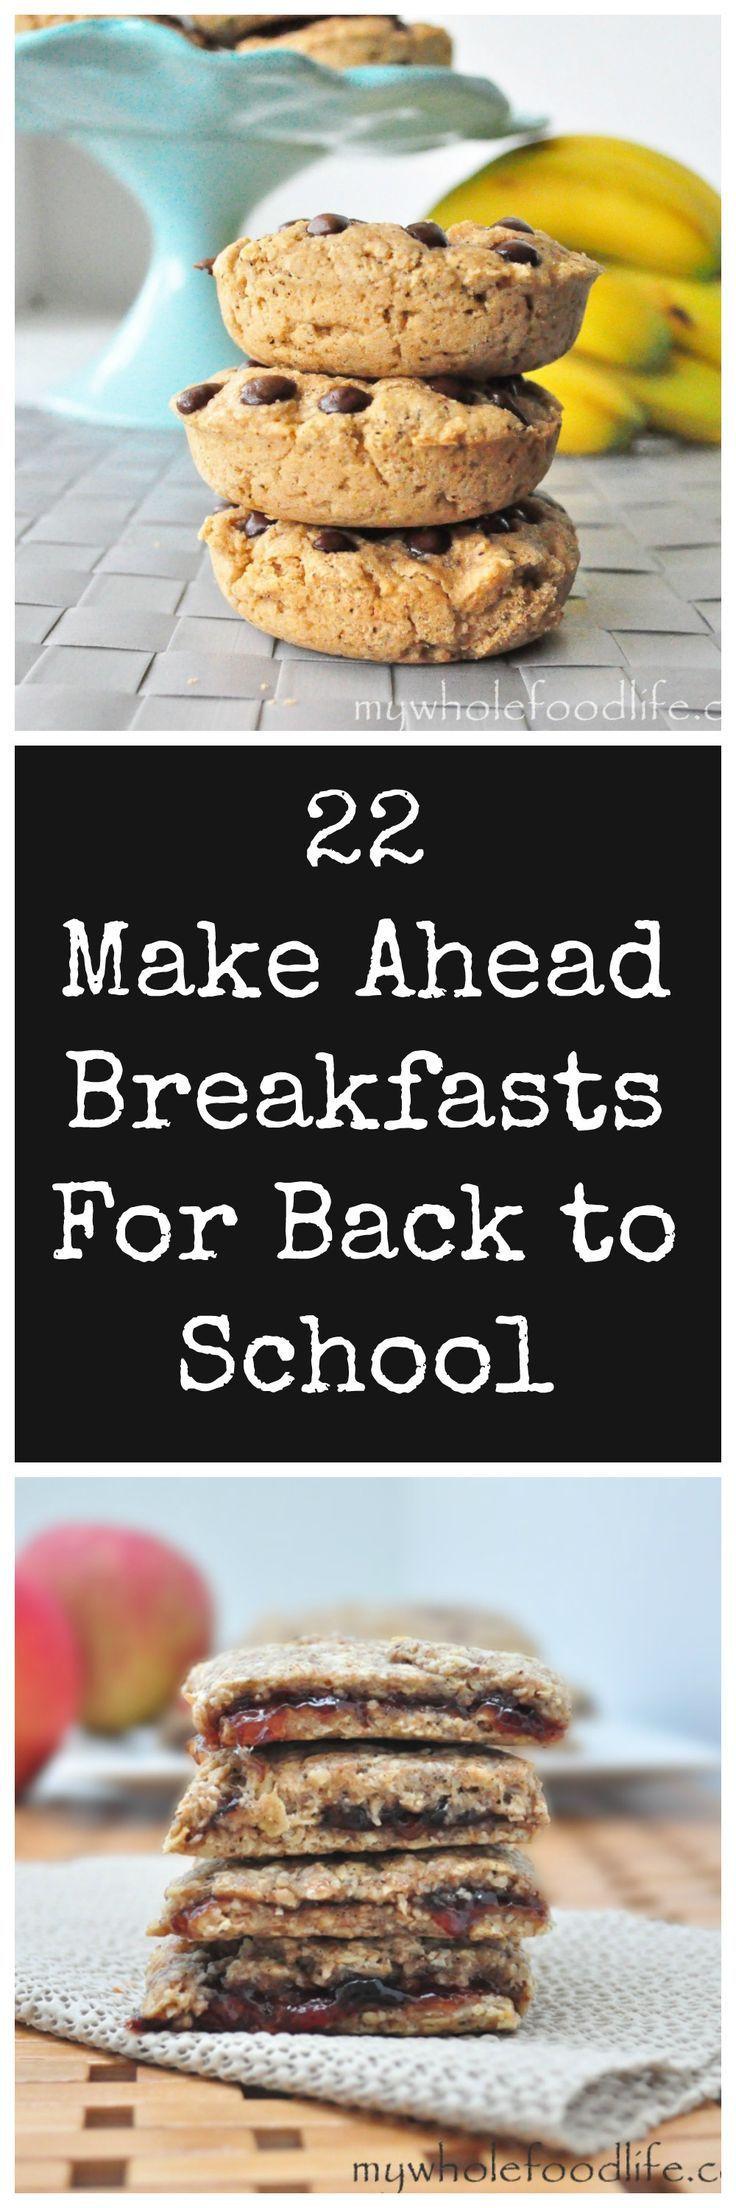 Make Ahead Healthy Breakfast  16 curated HOT Games ideas by marym2179